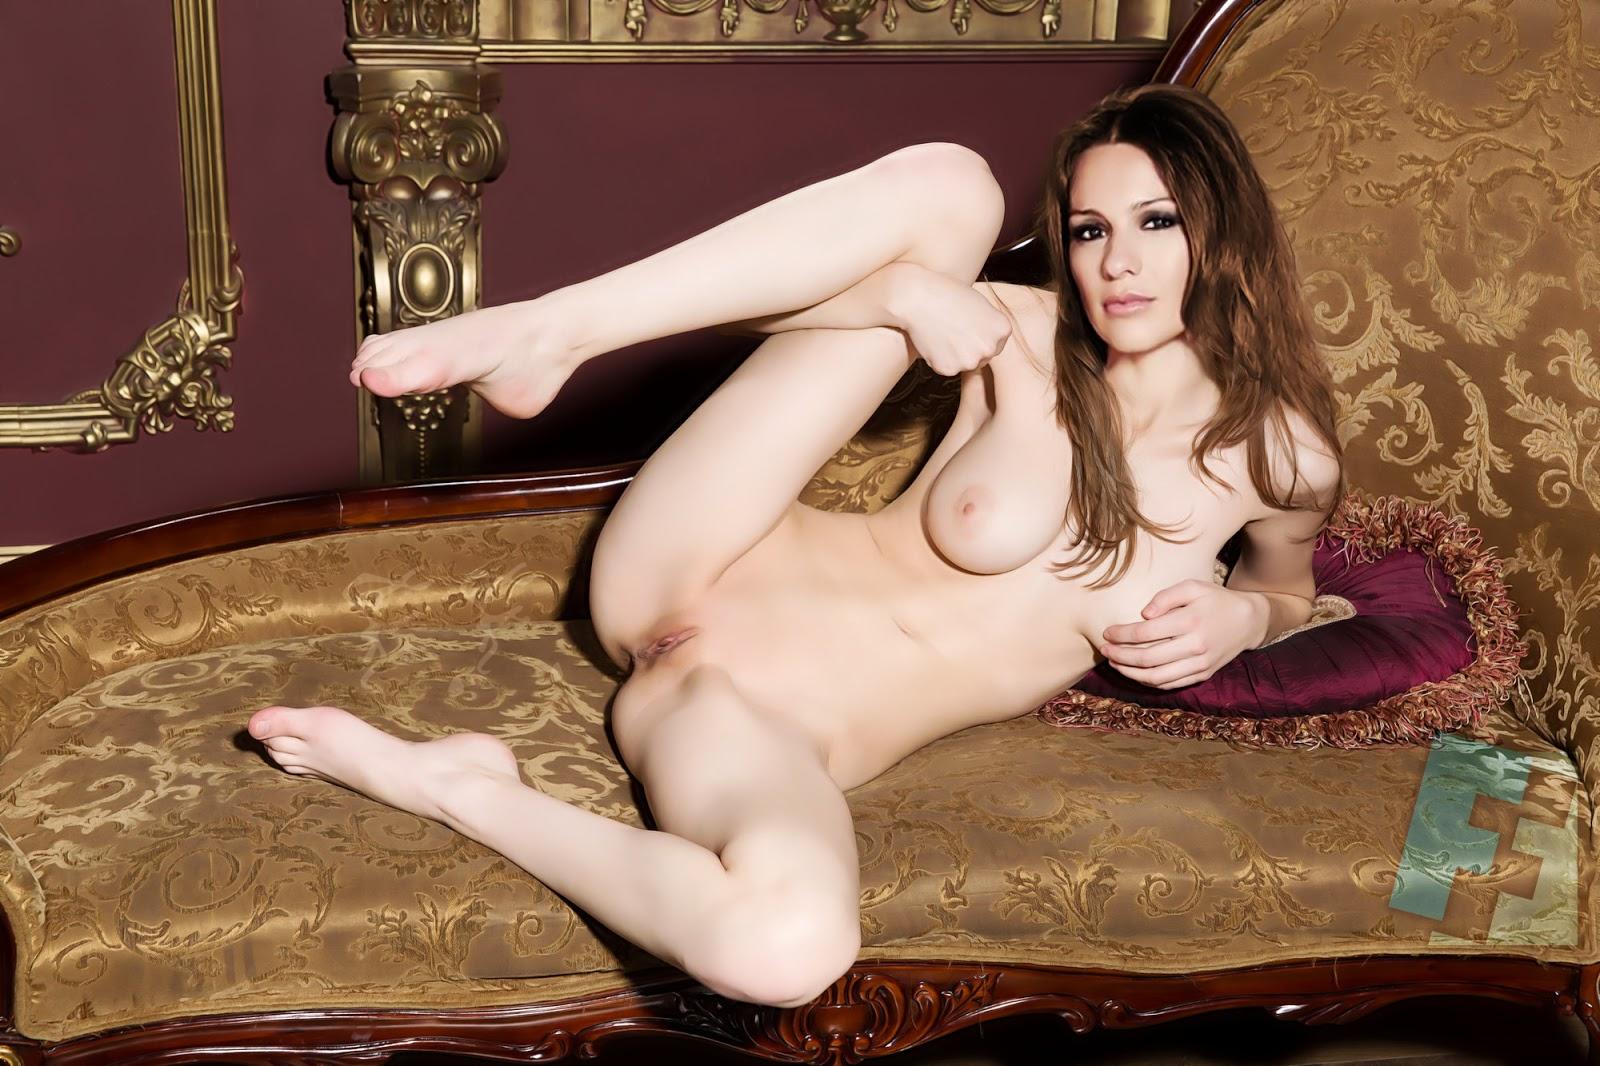 sex virgin hardcore pic